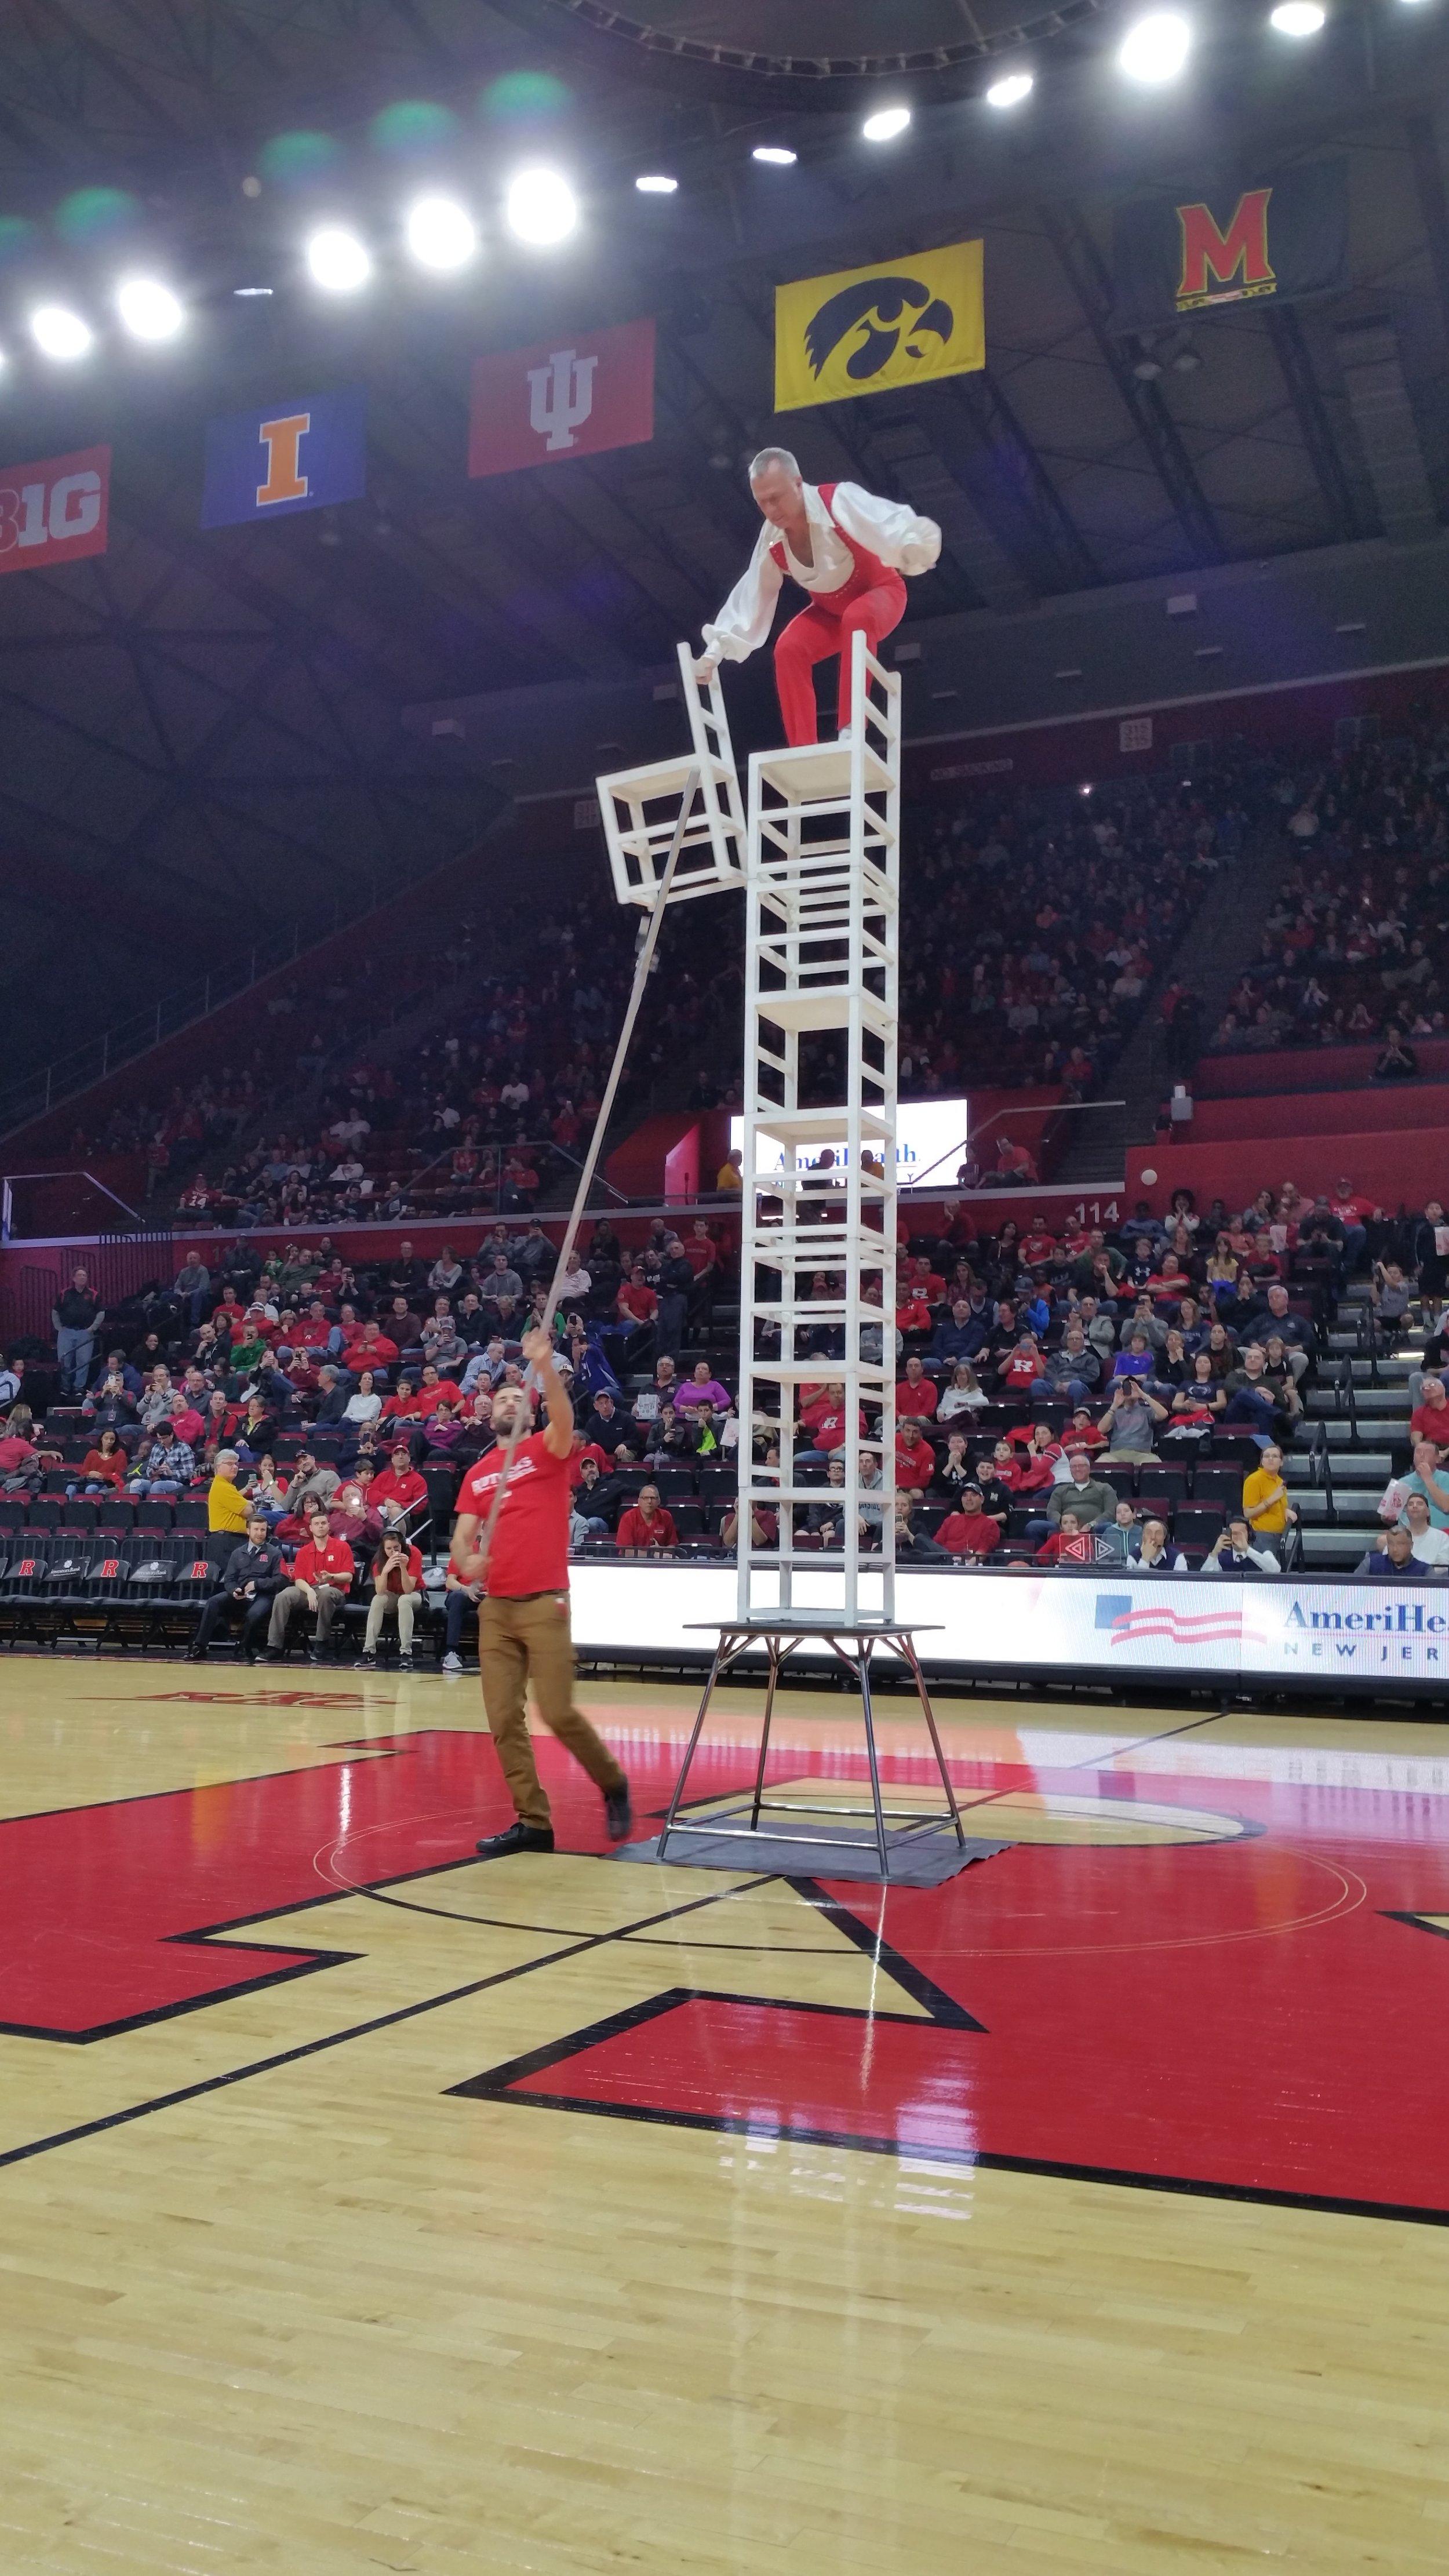 Rutgers Athletic Center (Piscataway Township, NJ)